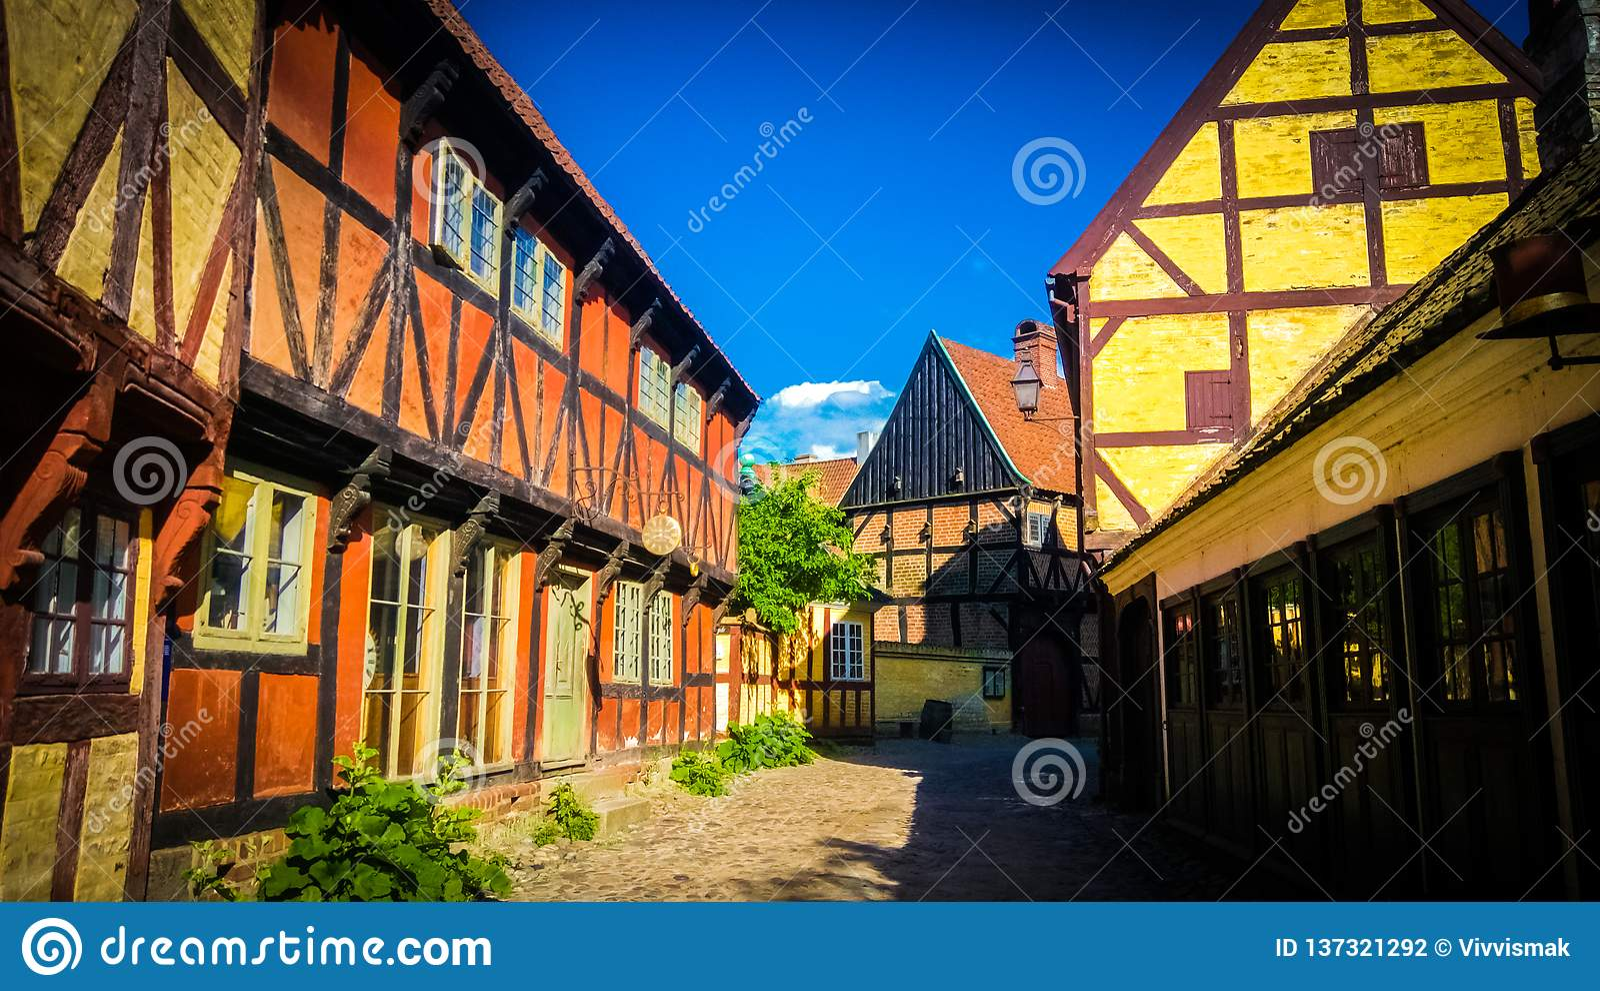 Traditional Danish houses at Den Gamle By in Aarhus, Denmark